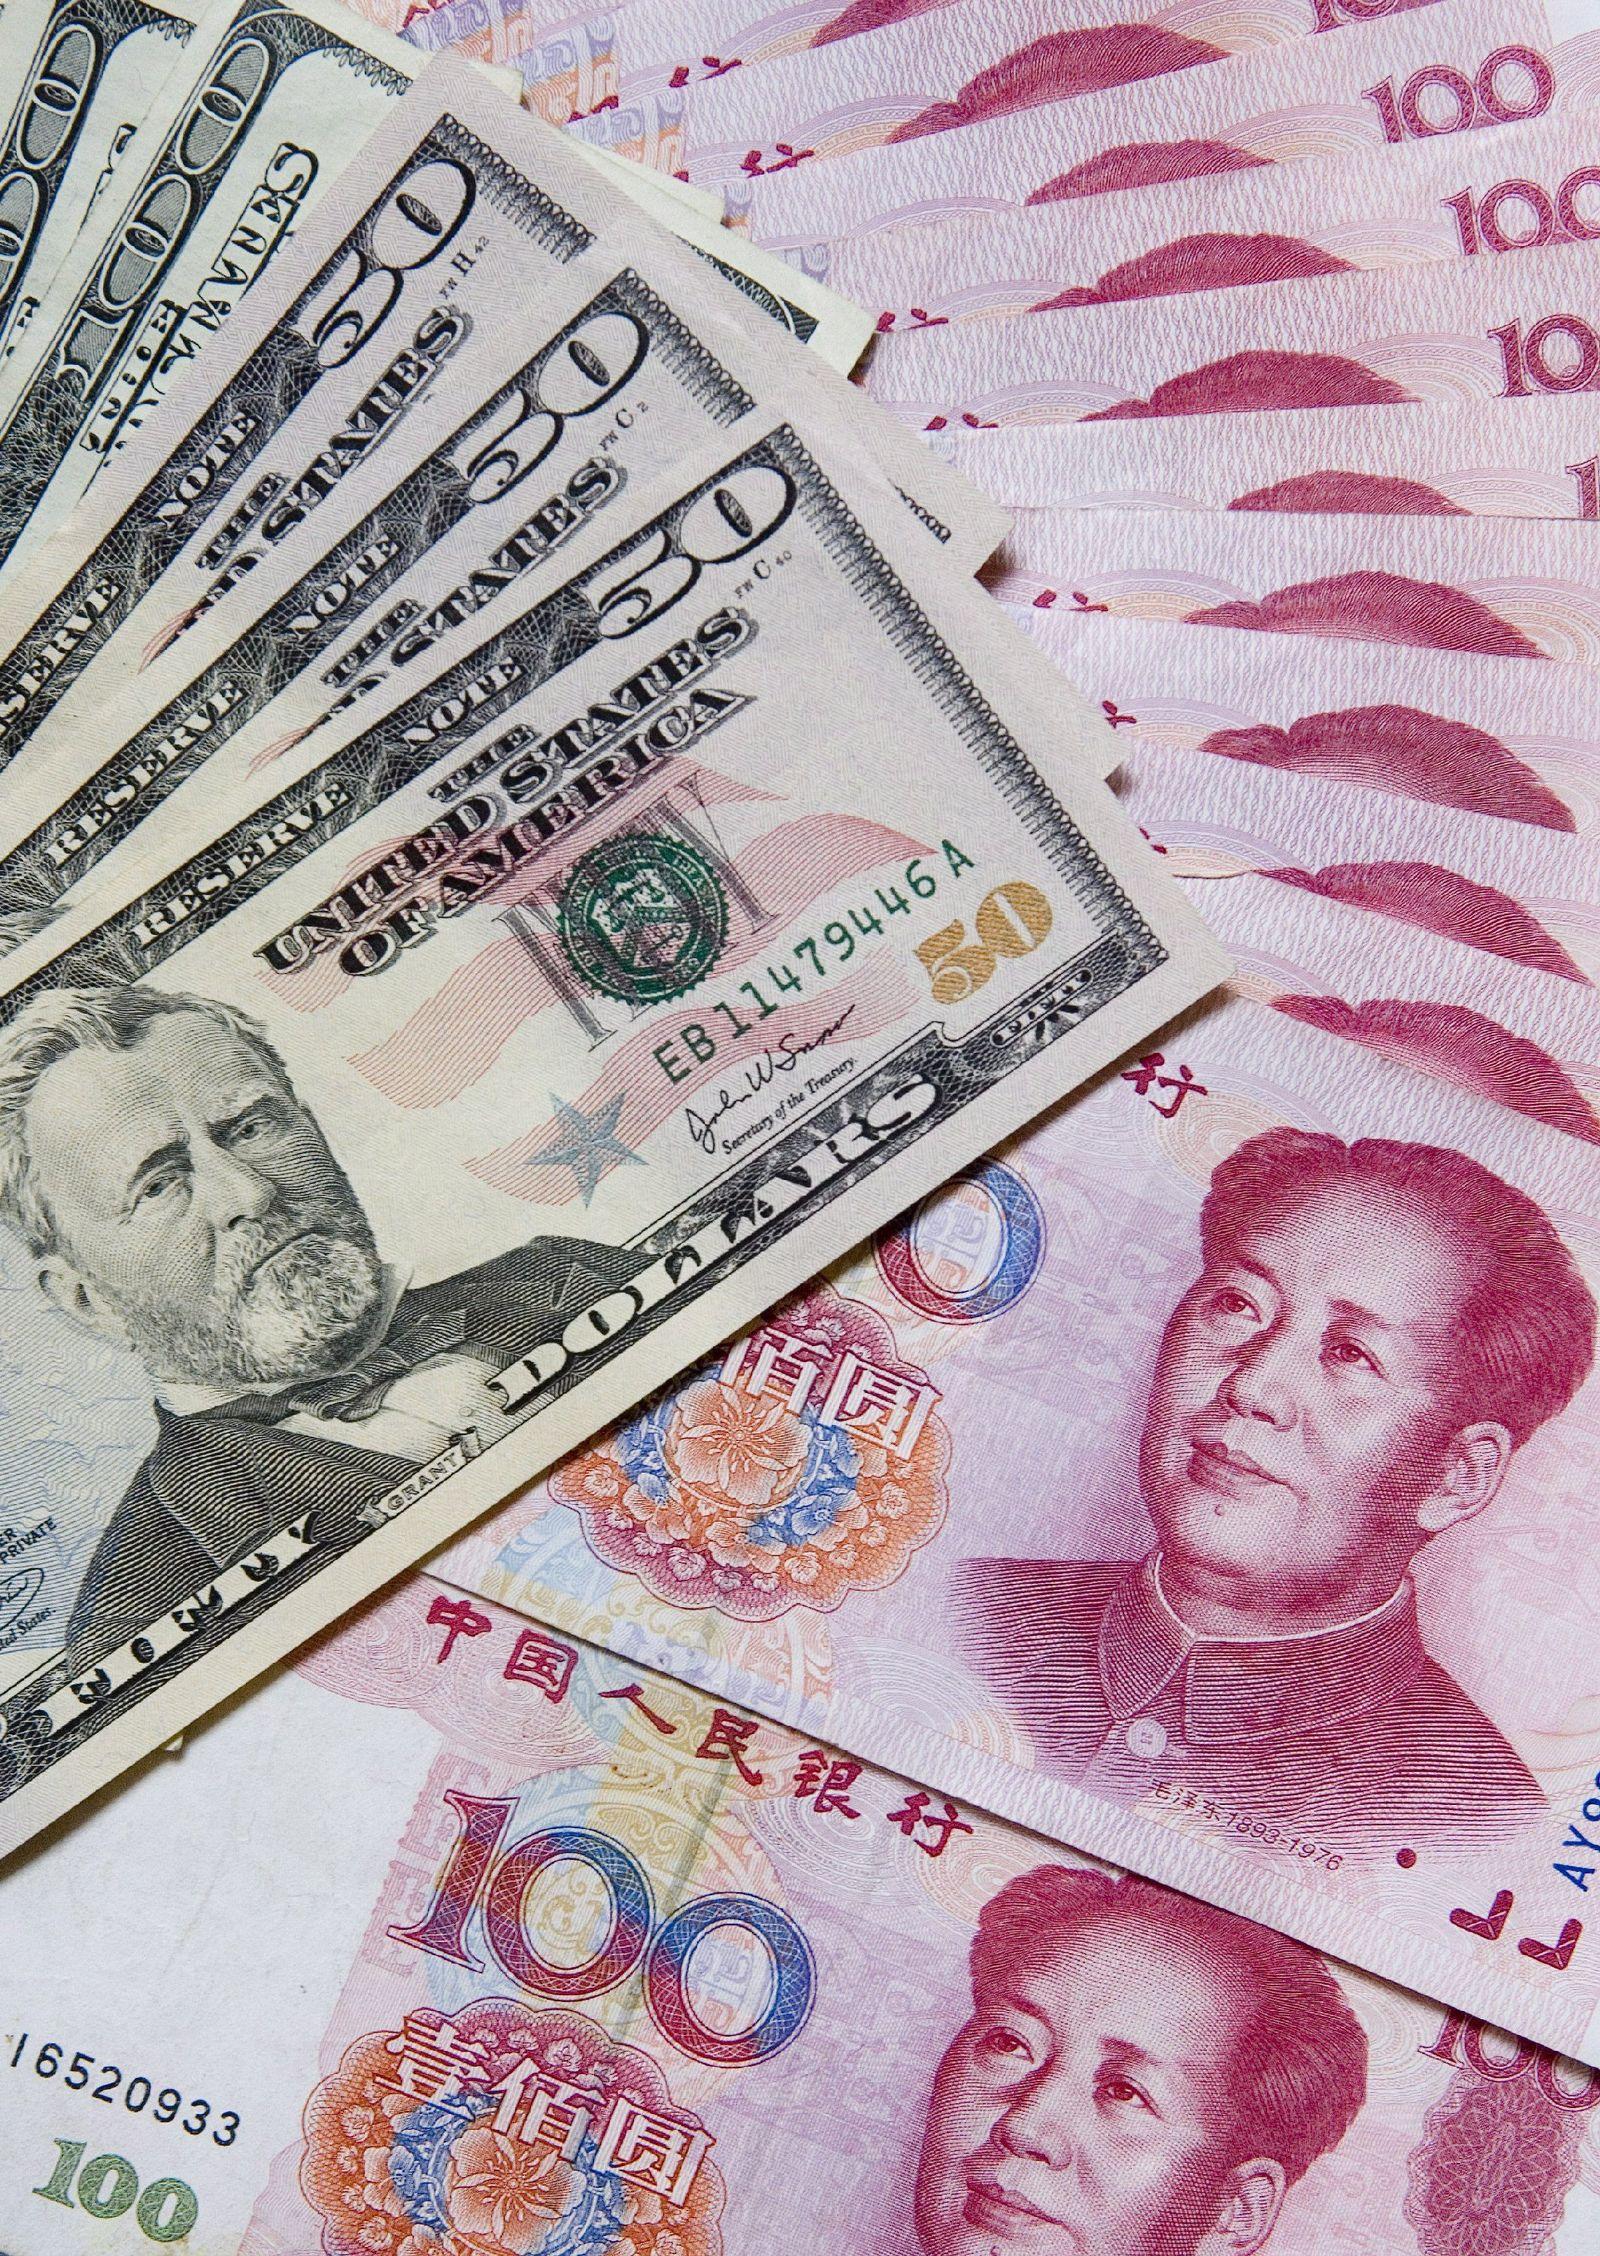 Chimerica / Banknoten / Yuan / Dollar